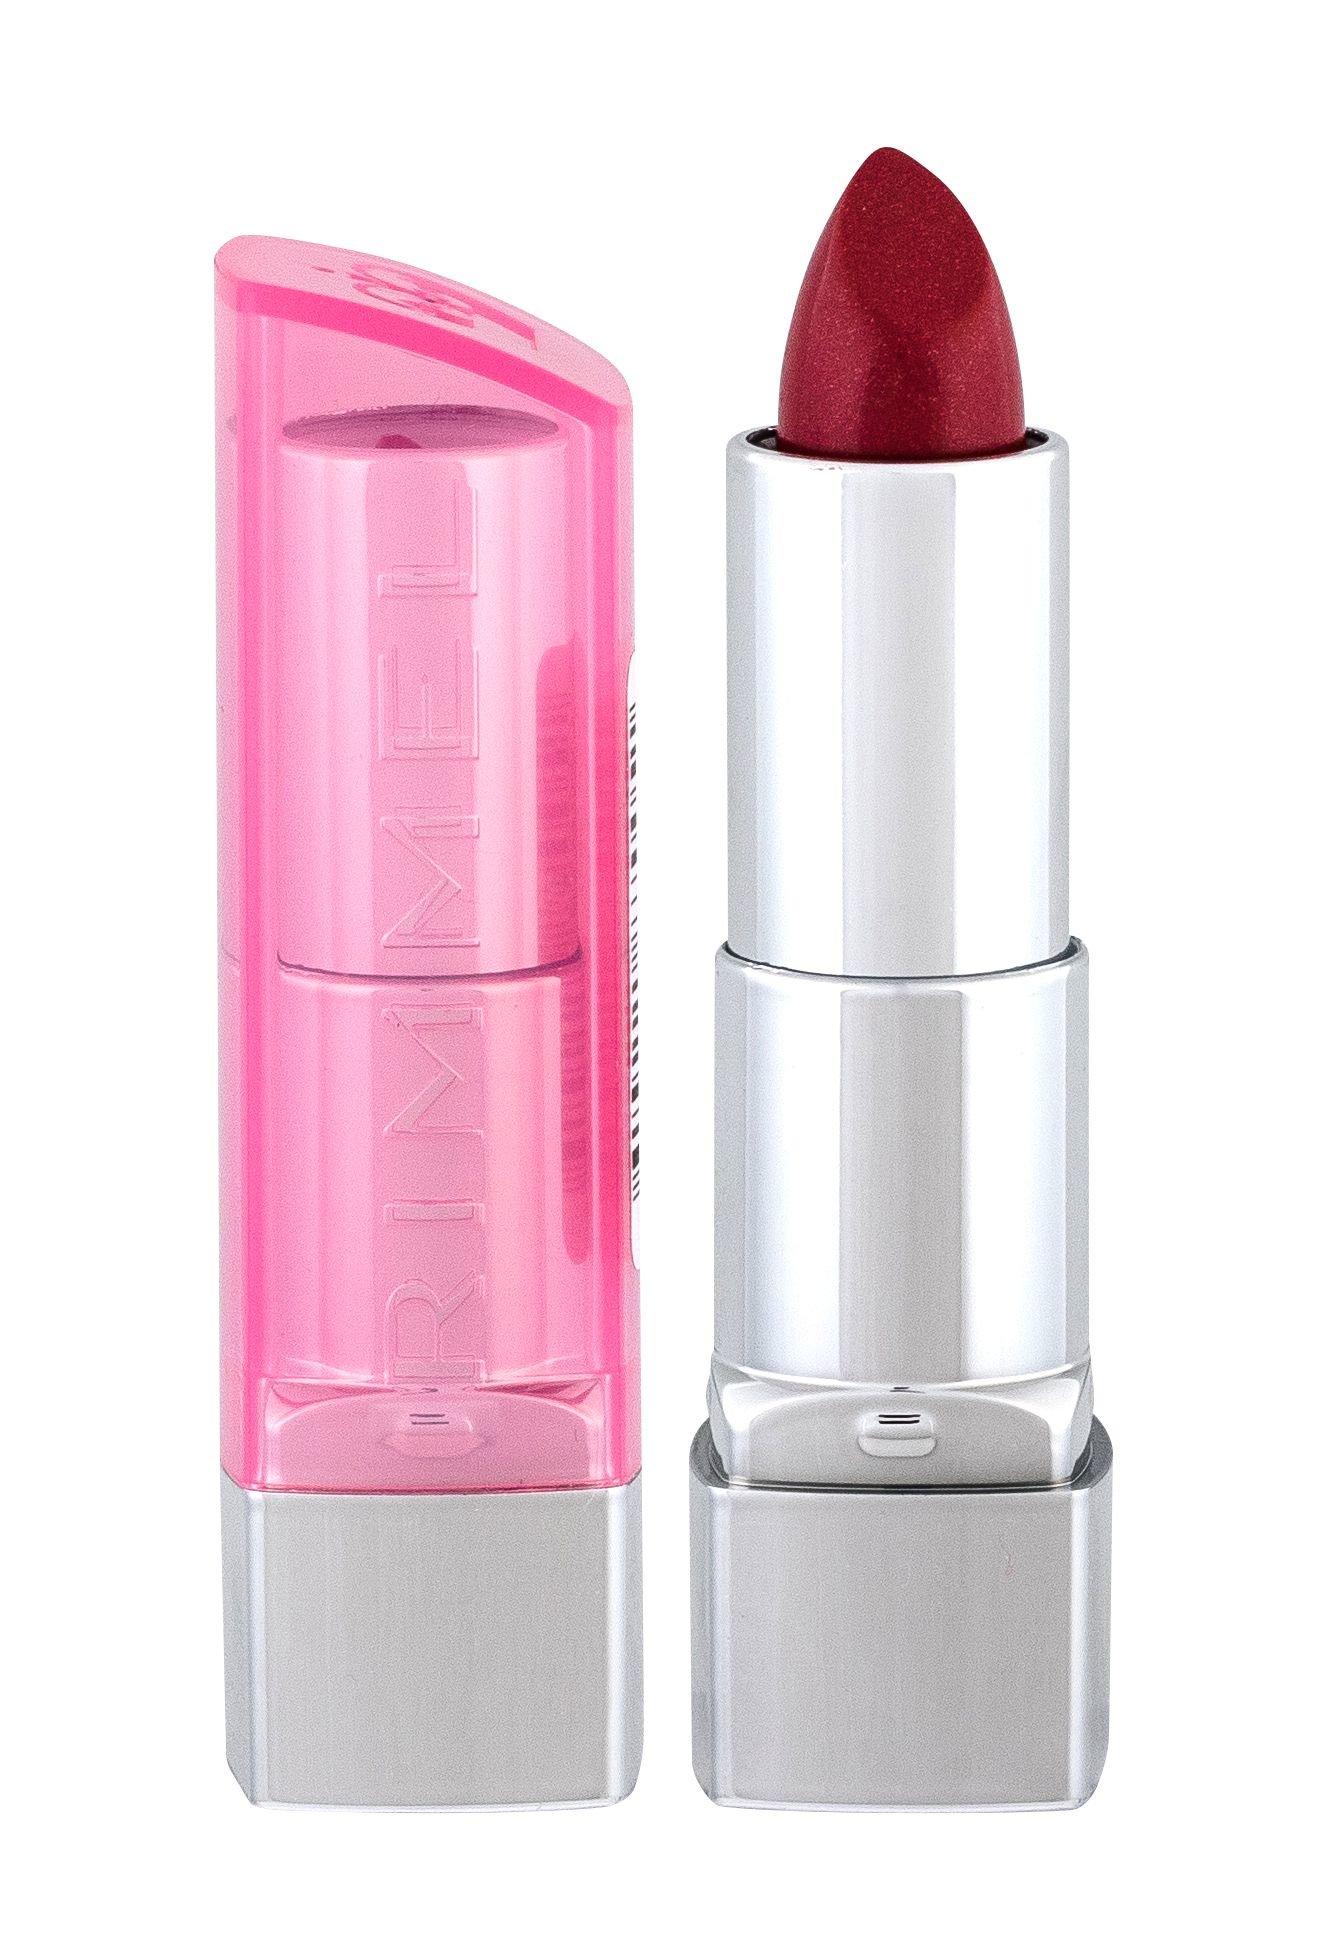 Rimmel London Moisture Renew Lipstick 4ml 400 Good Mauve